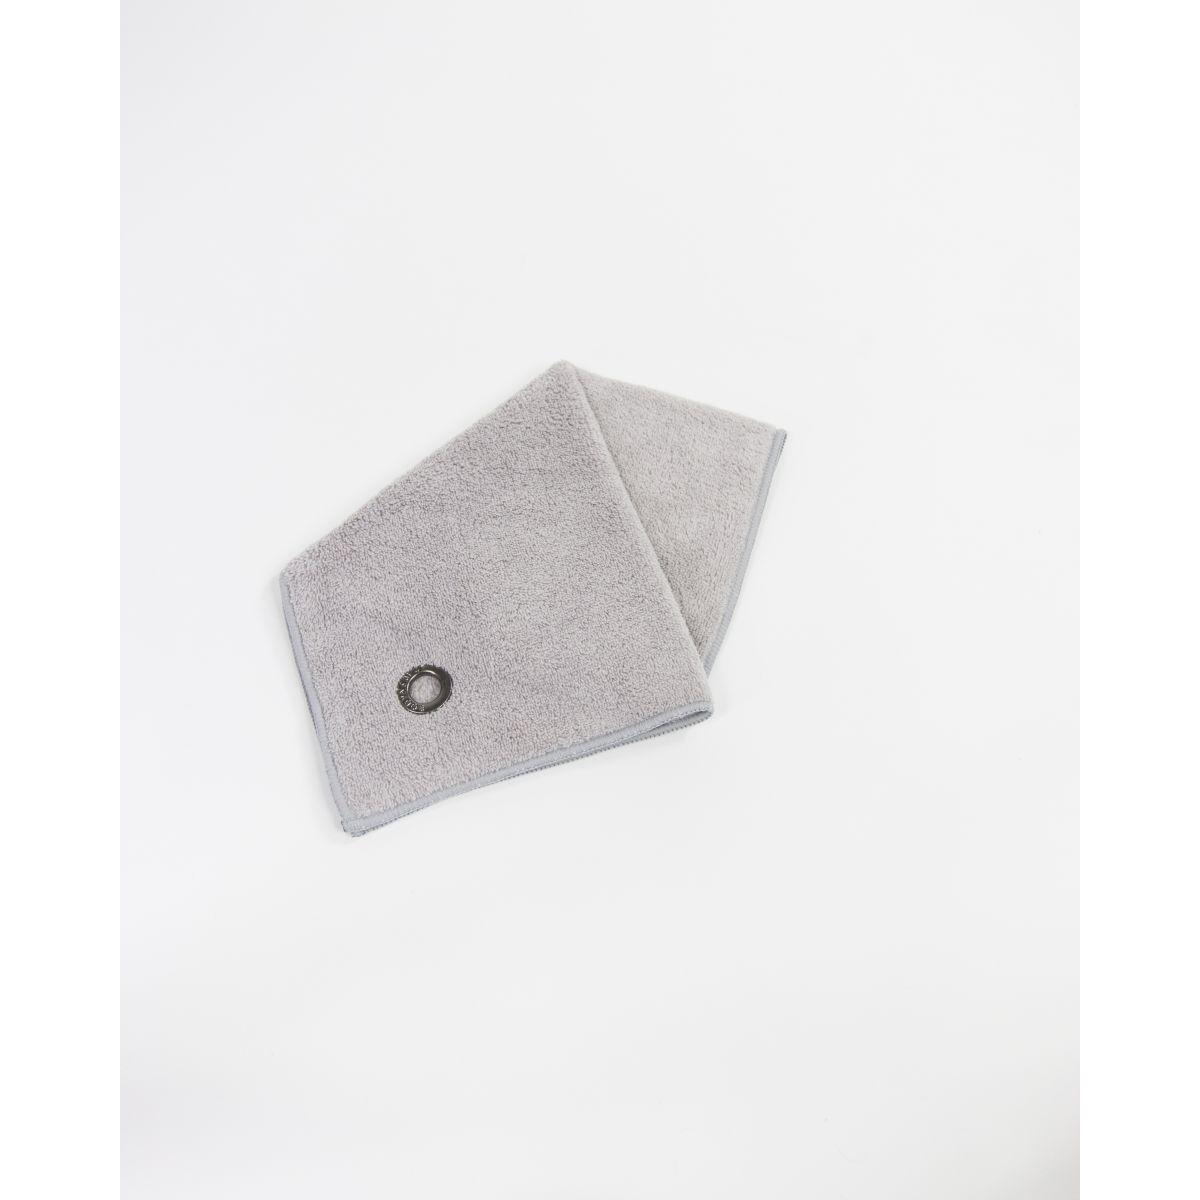 serviette mains visage microfibre vaianu gris perle bodynamic. Black Bedroom Furniture Sets. Home Design Ideas